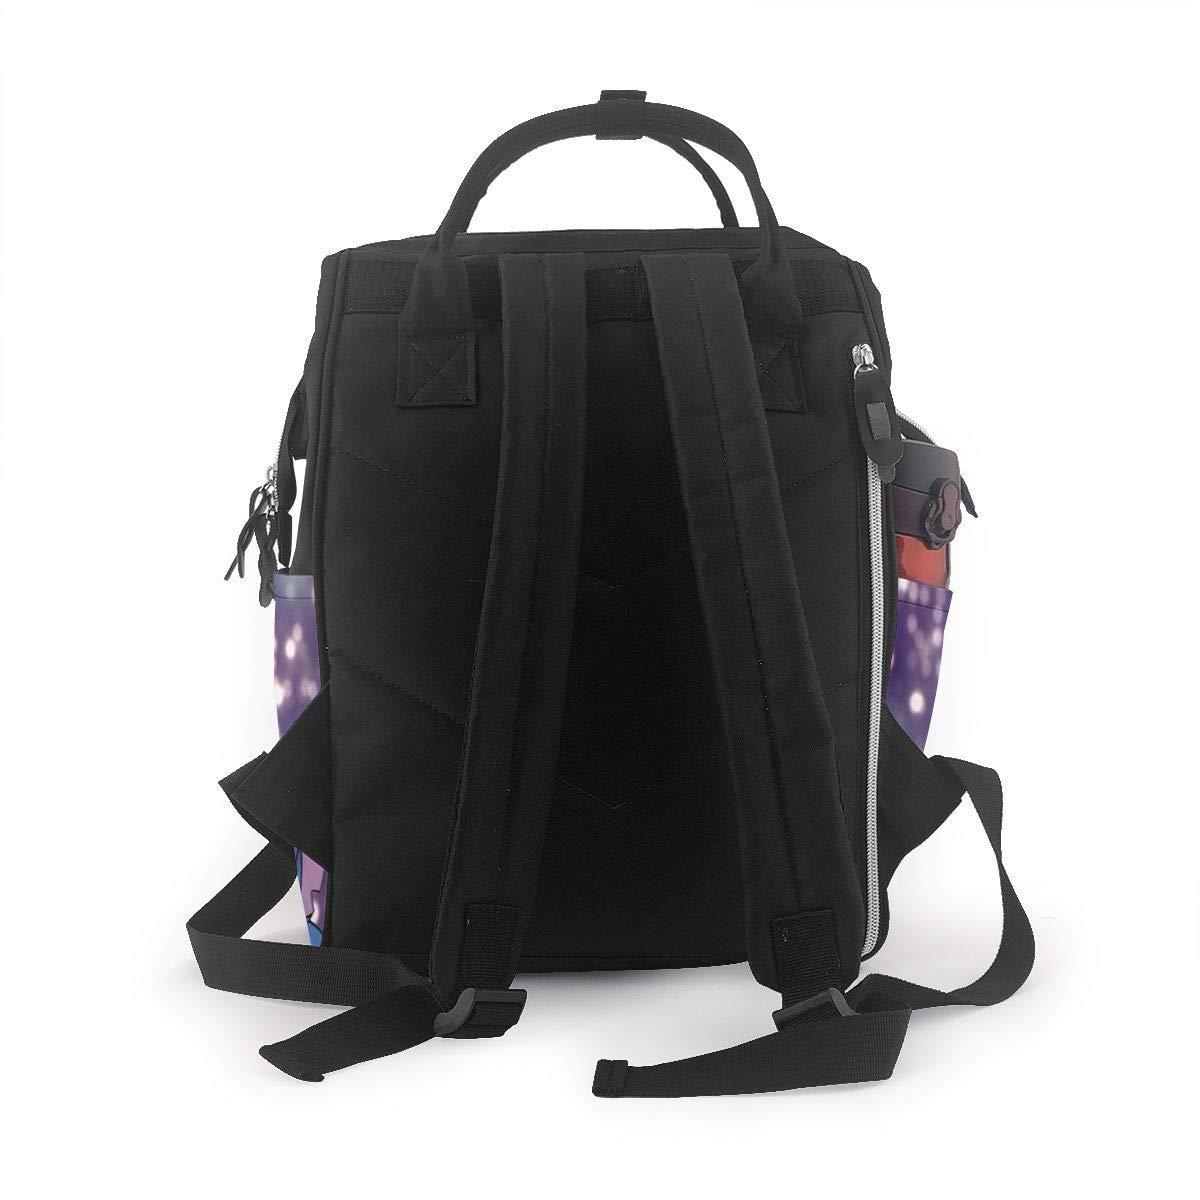 Stitch Multifunction Waterproof Travel Rucksack Maternity Baby Nappy Changing Bags NHJYU Wickeltasche Rucksack